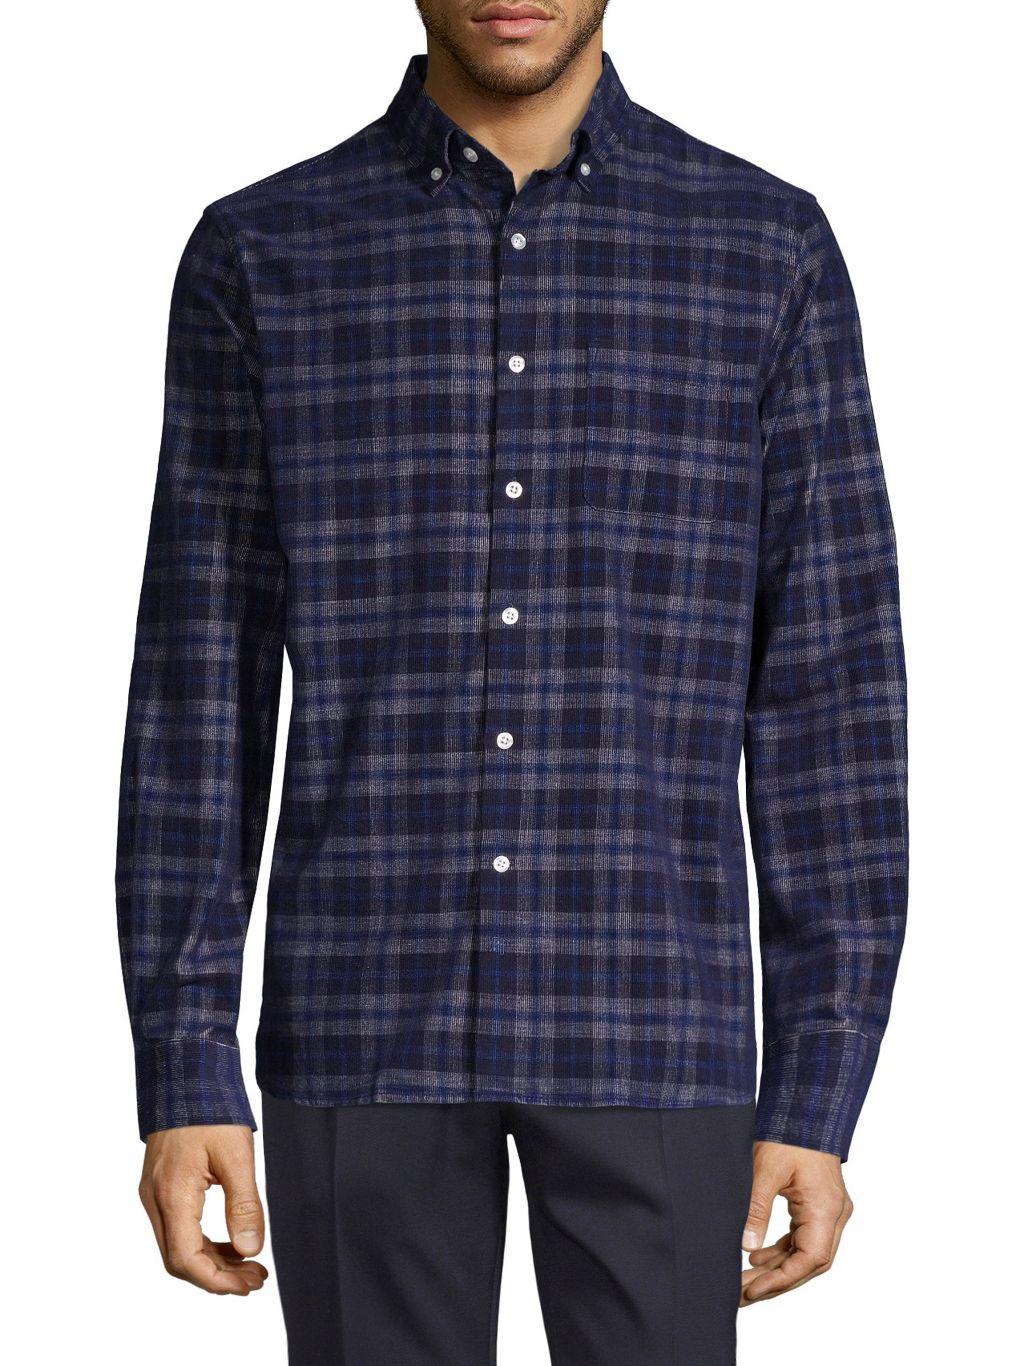 Hickey Freeman Plaid Long-Sleeve Shirt